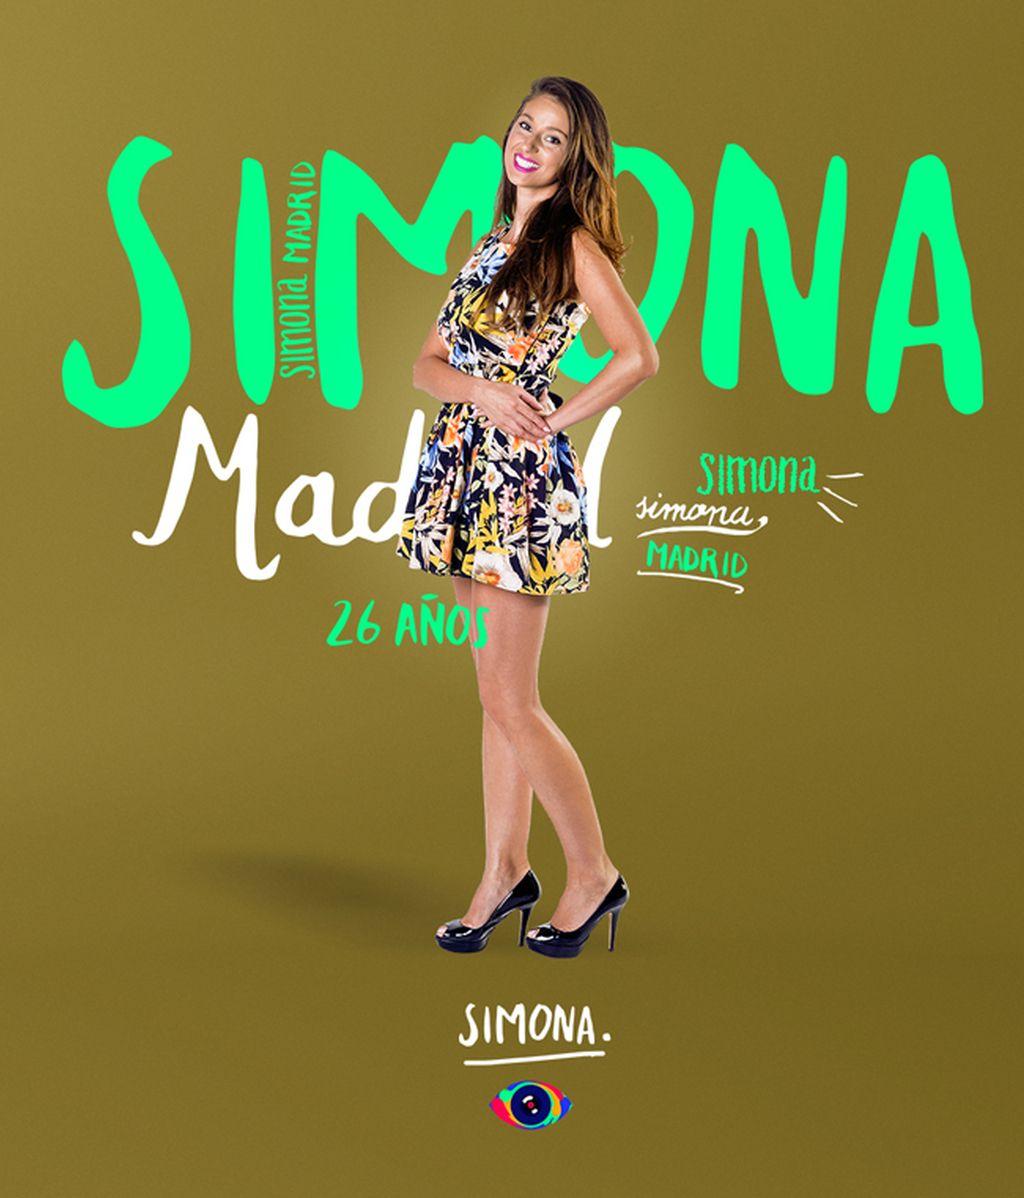 Simona, 26 años (Madrid)